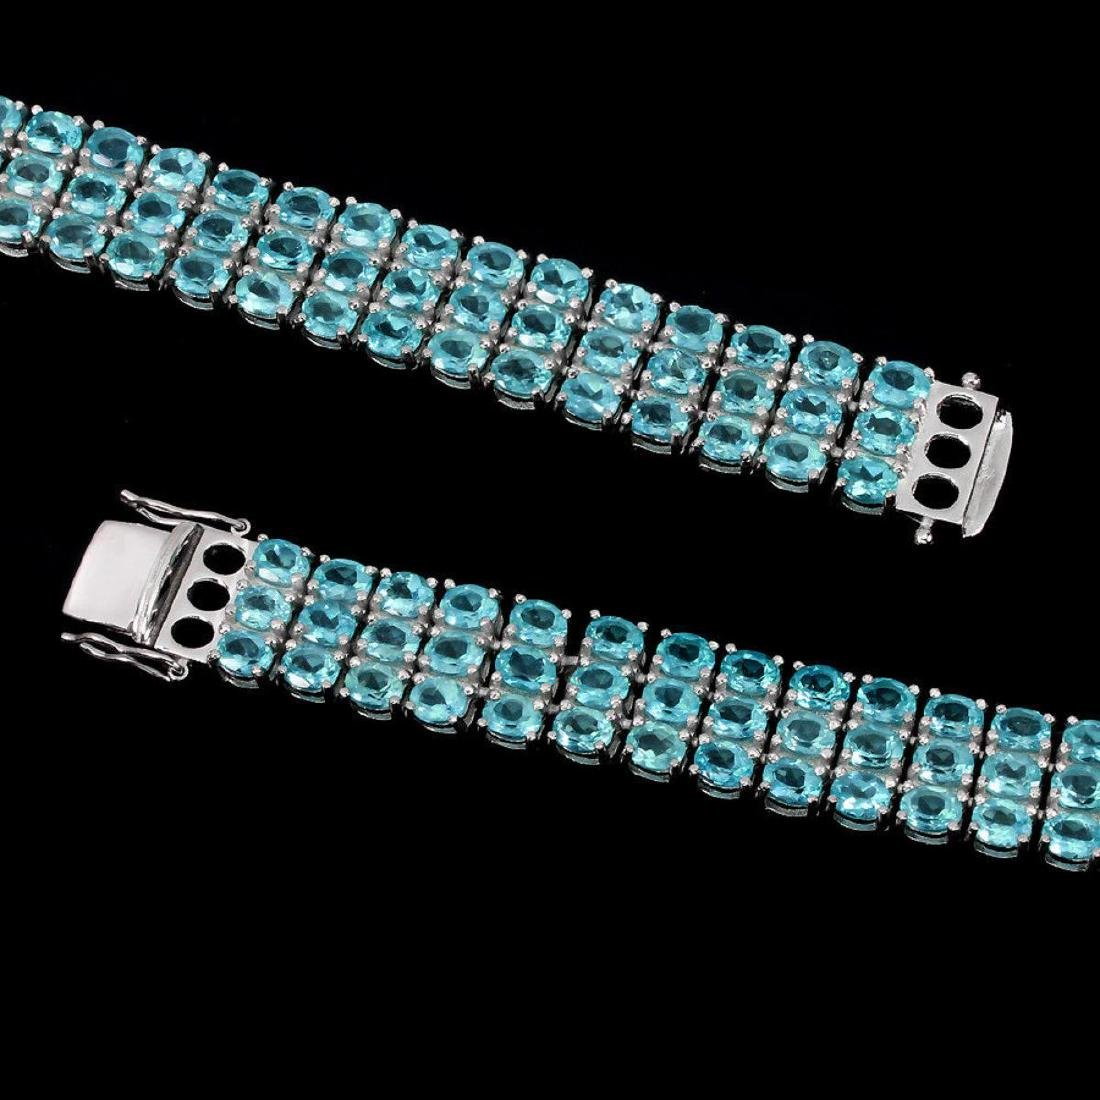 Natural Brazil Blue Apatite 169 Carats Bracelet - 3